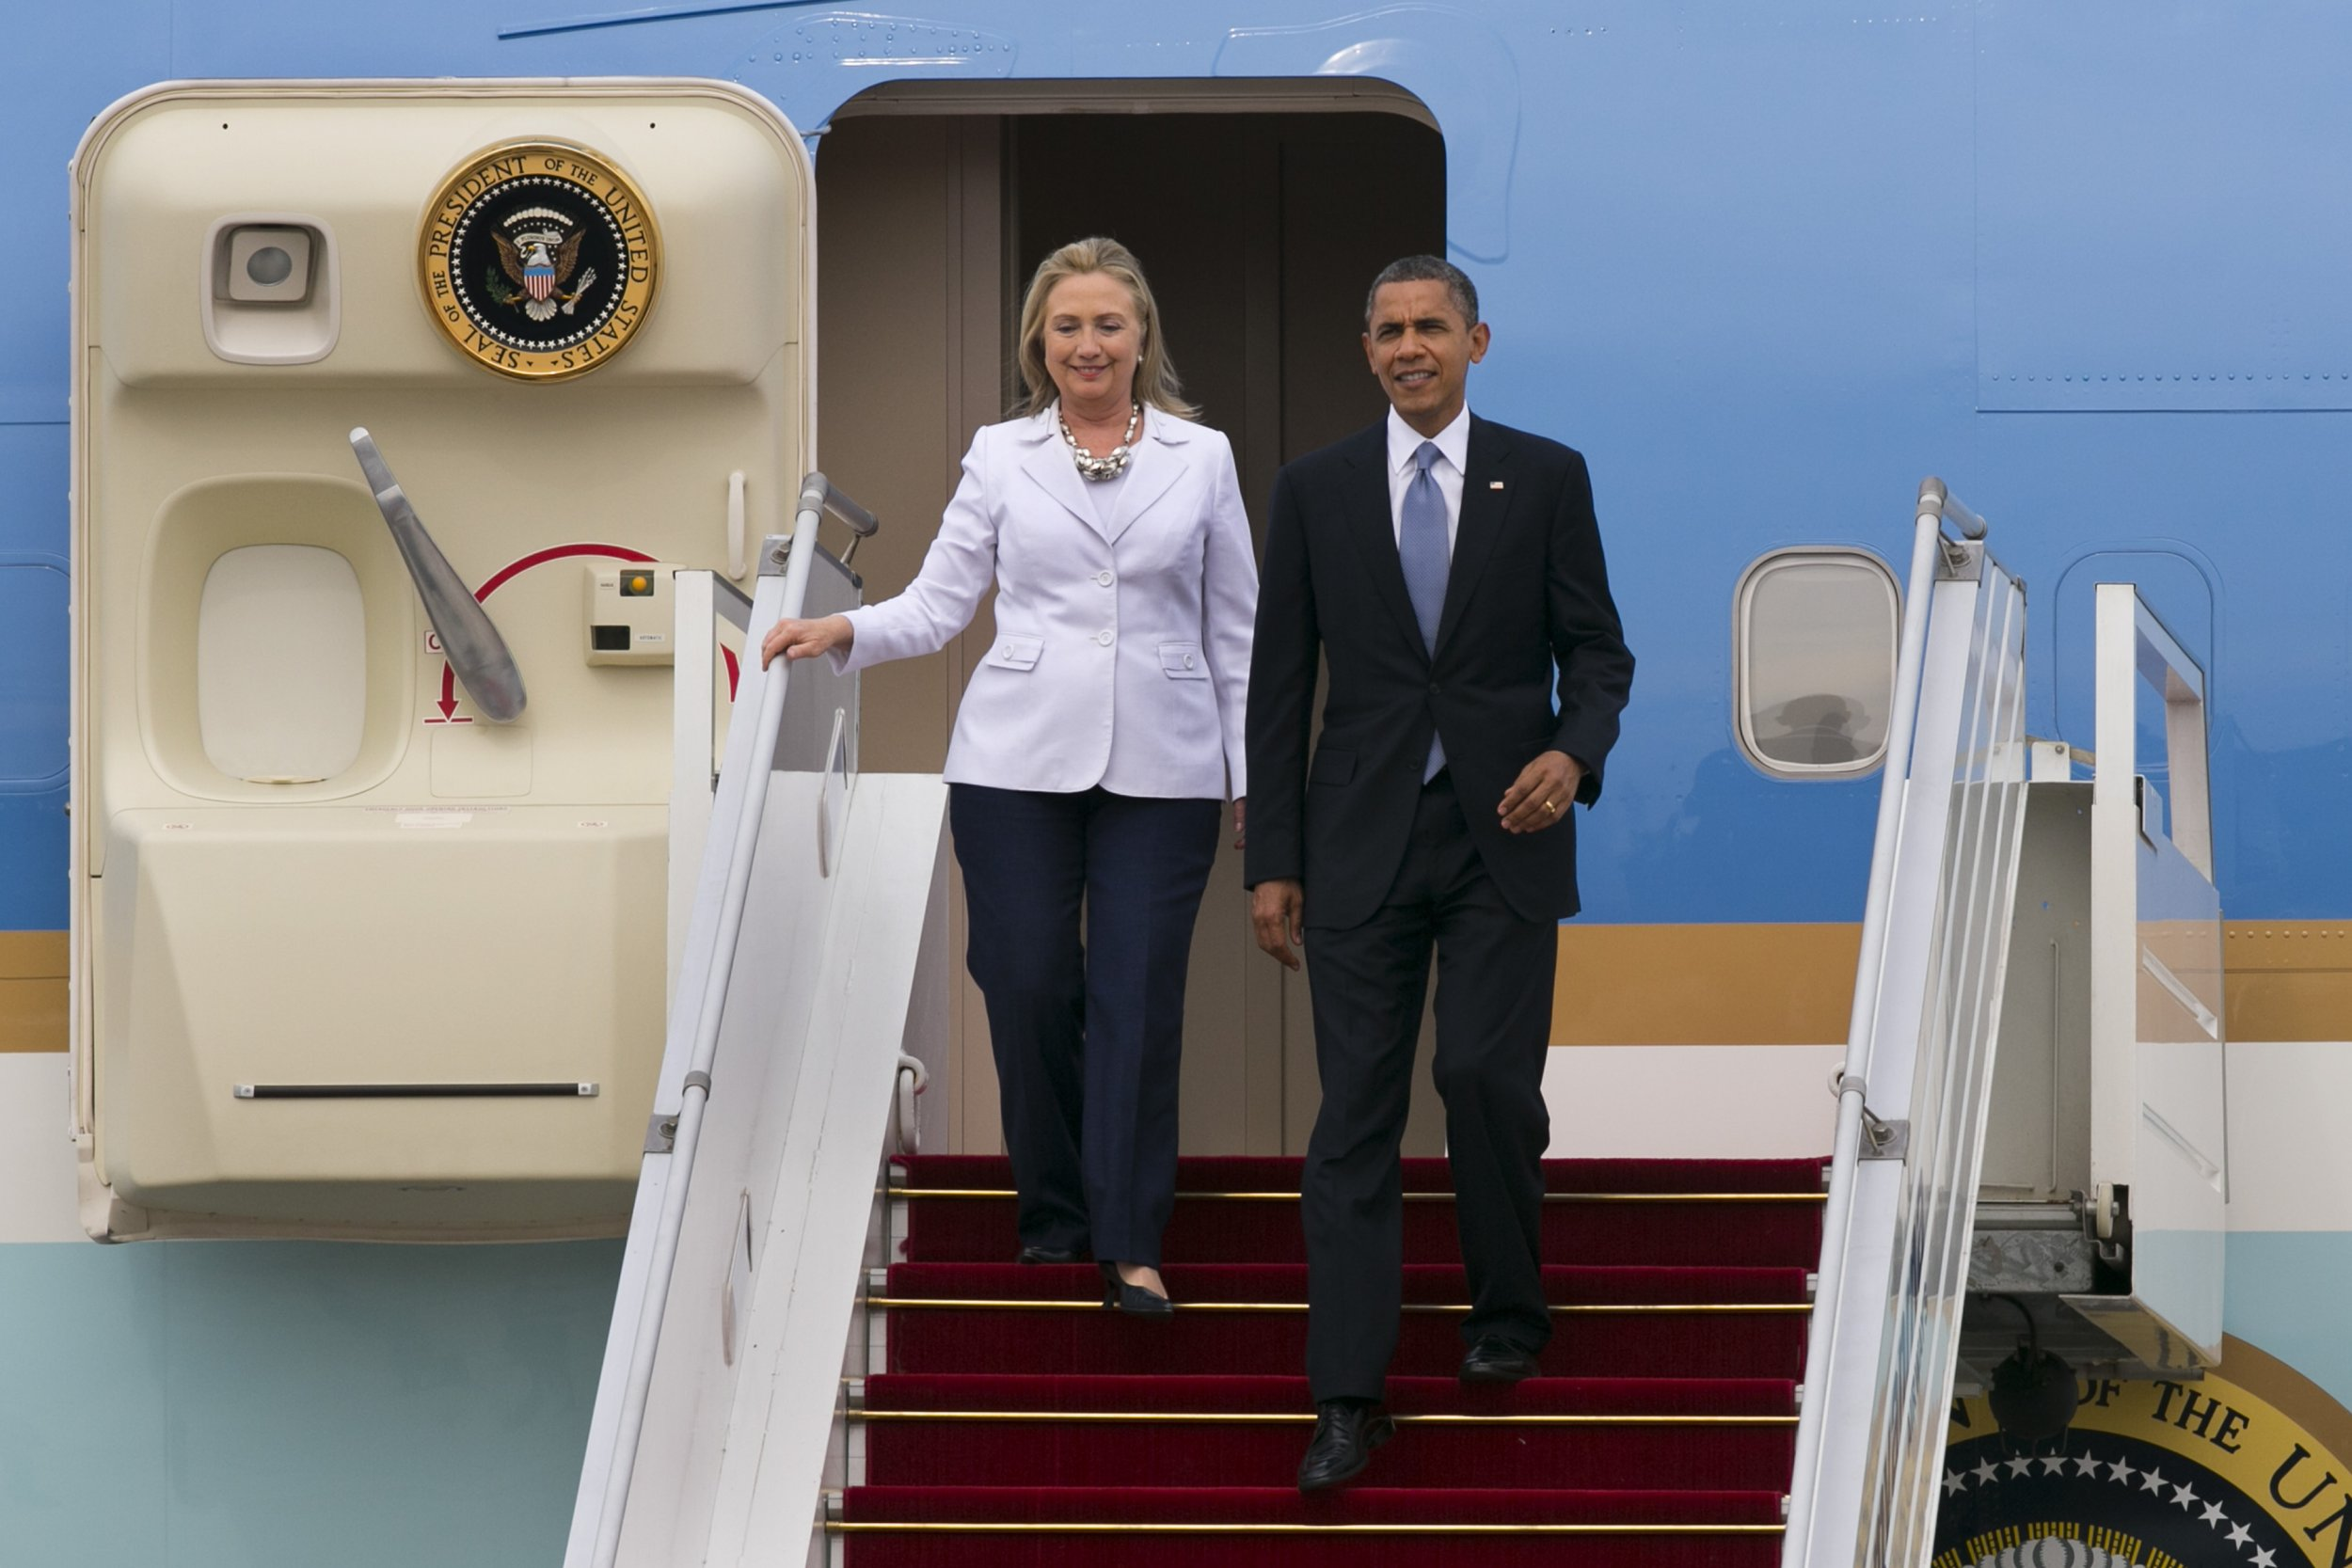 Barack Obama and Hillary Clinton landing in Burma